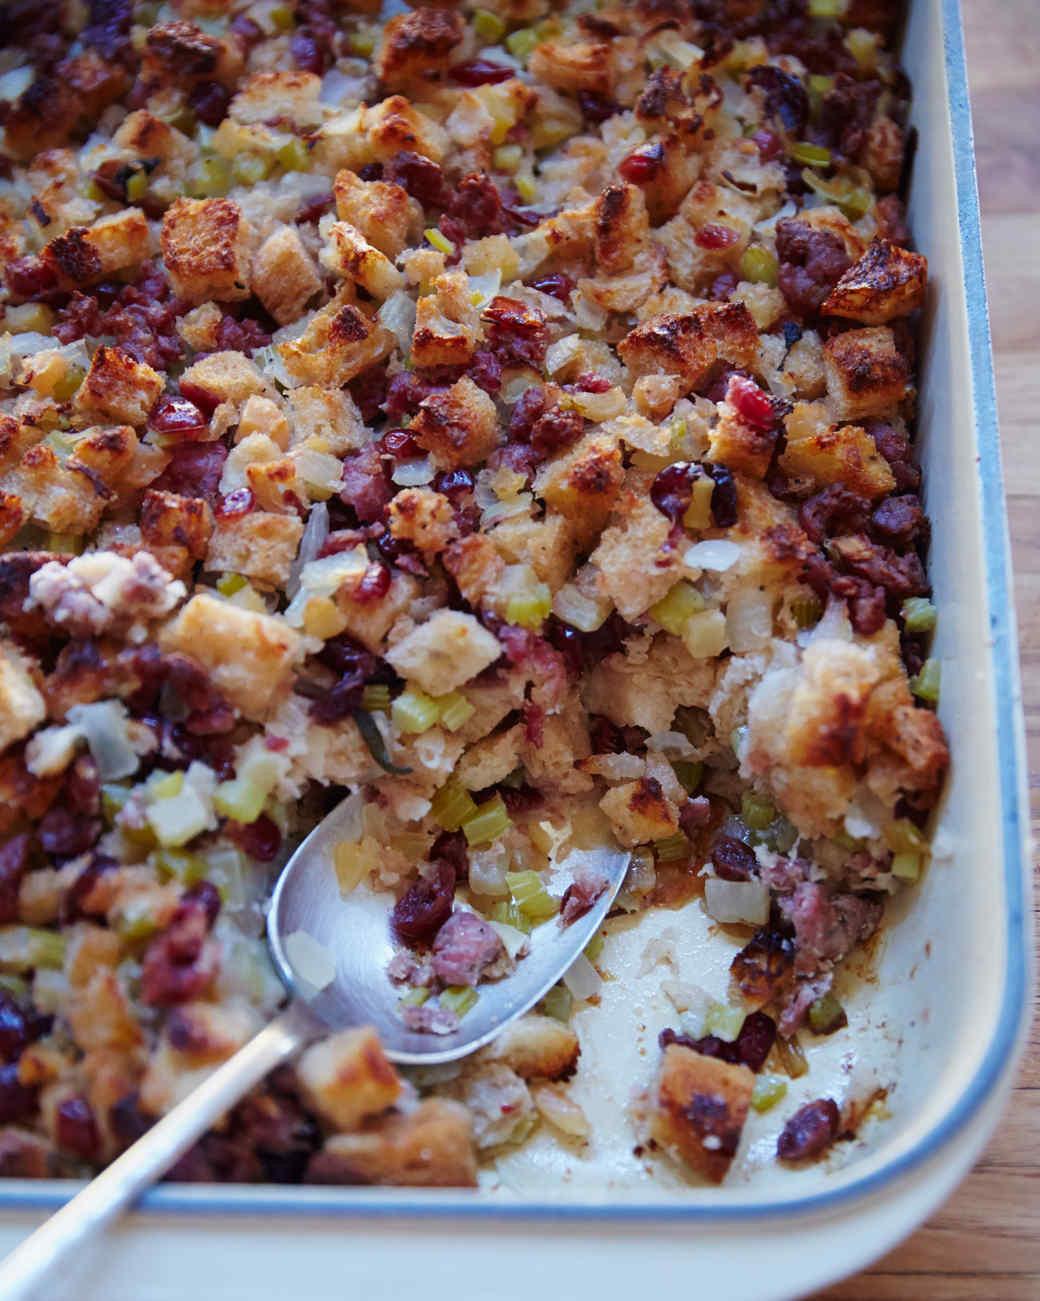 Martha Stewart Thanksgiving Turkey  Anne Quatrano s Thanksgiving Recipes